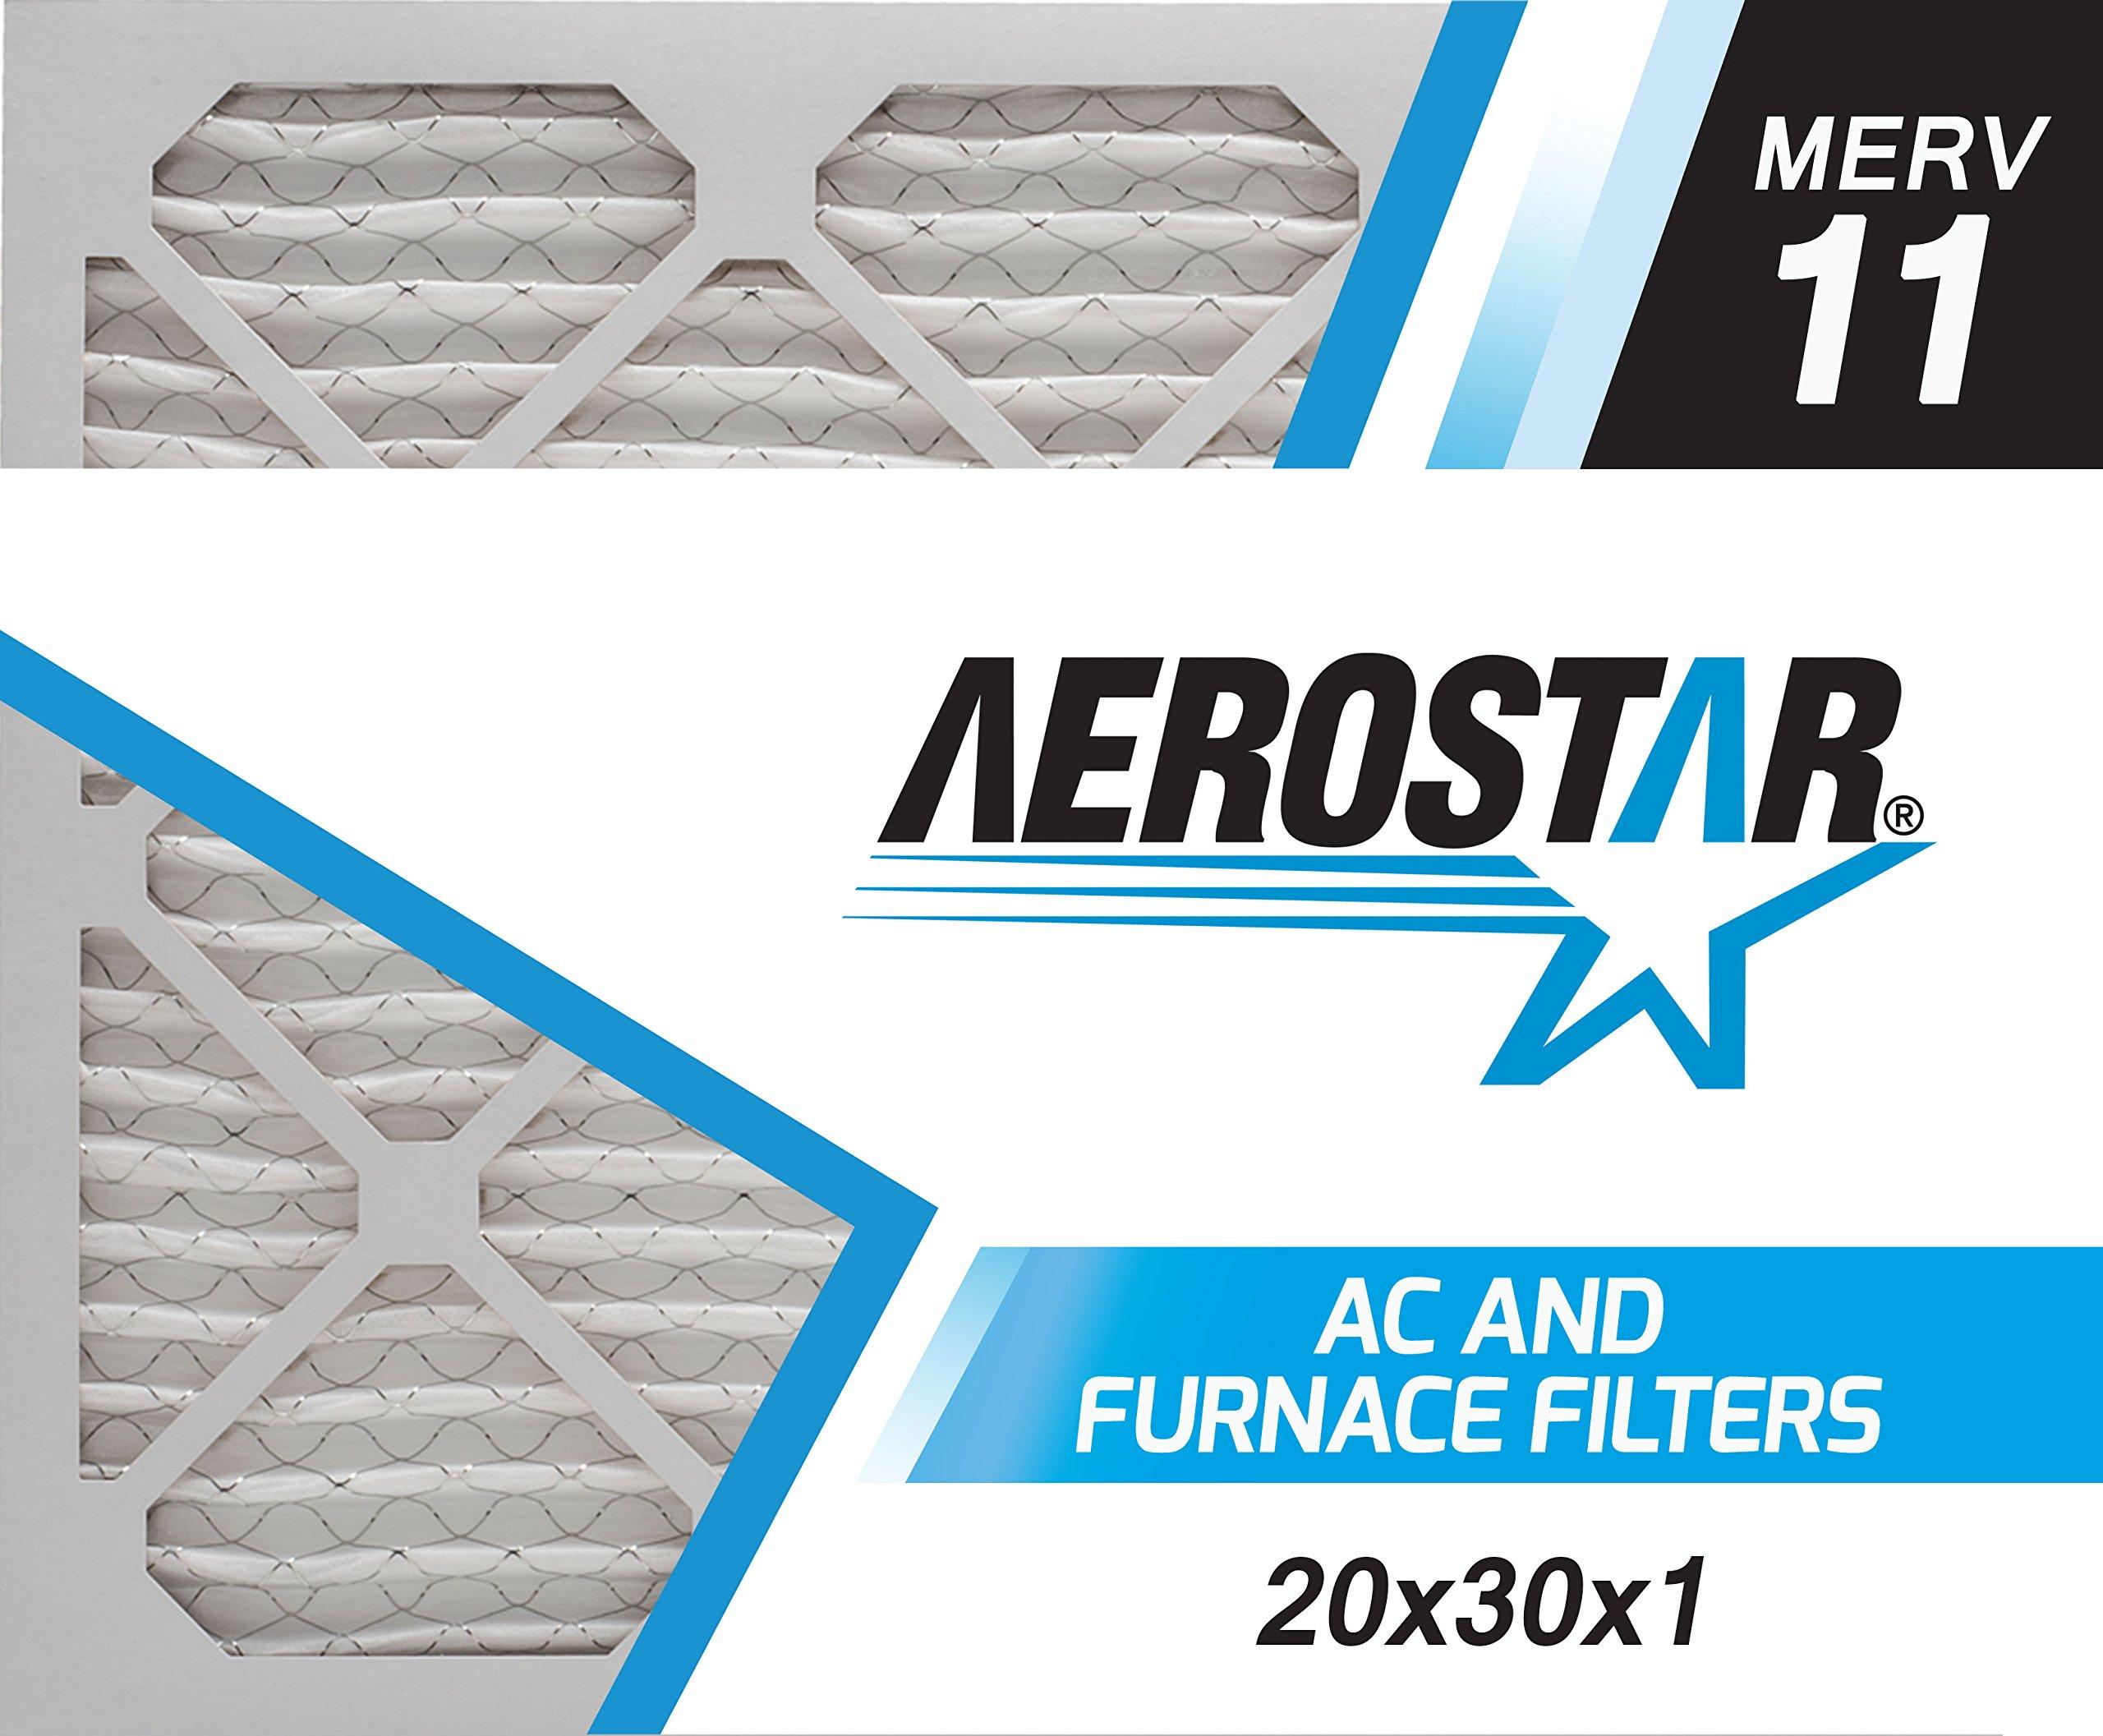 Aerostar 20x30x1 MERV 11, Pleated Air Filter, 20x30x1, Box of 6, Made in the USA